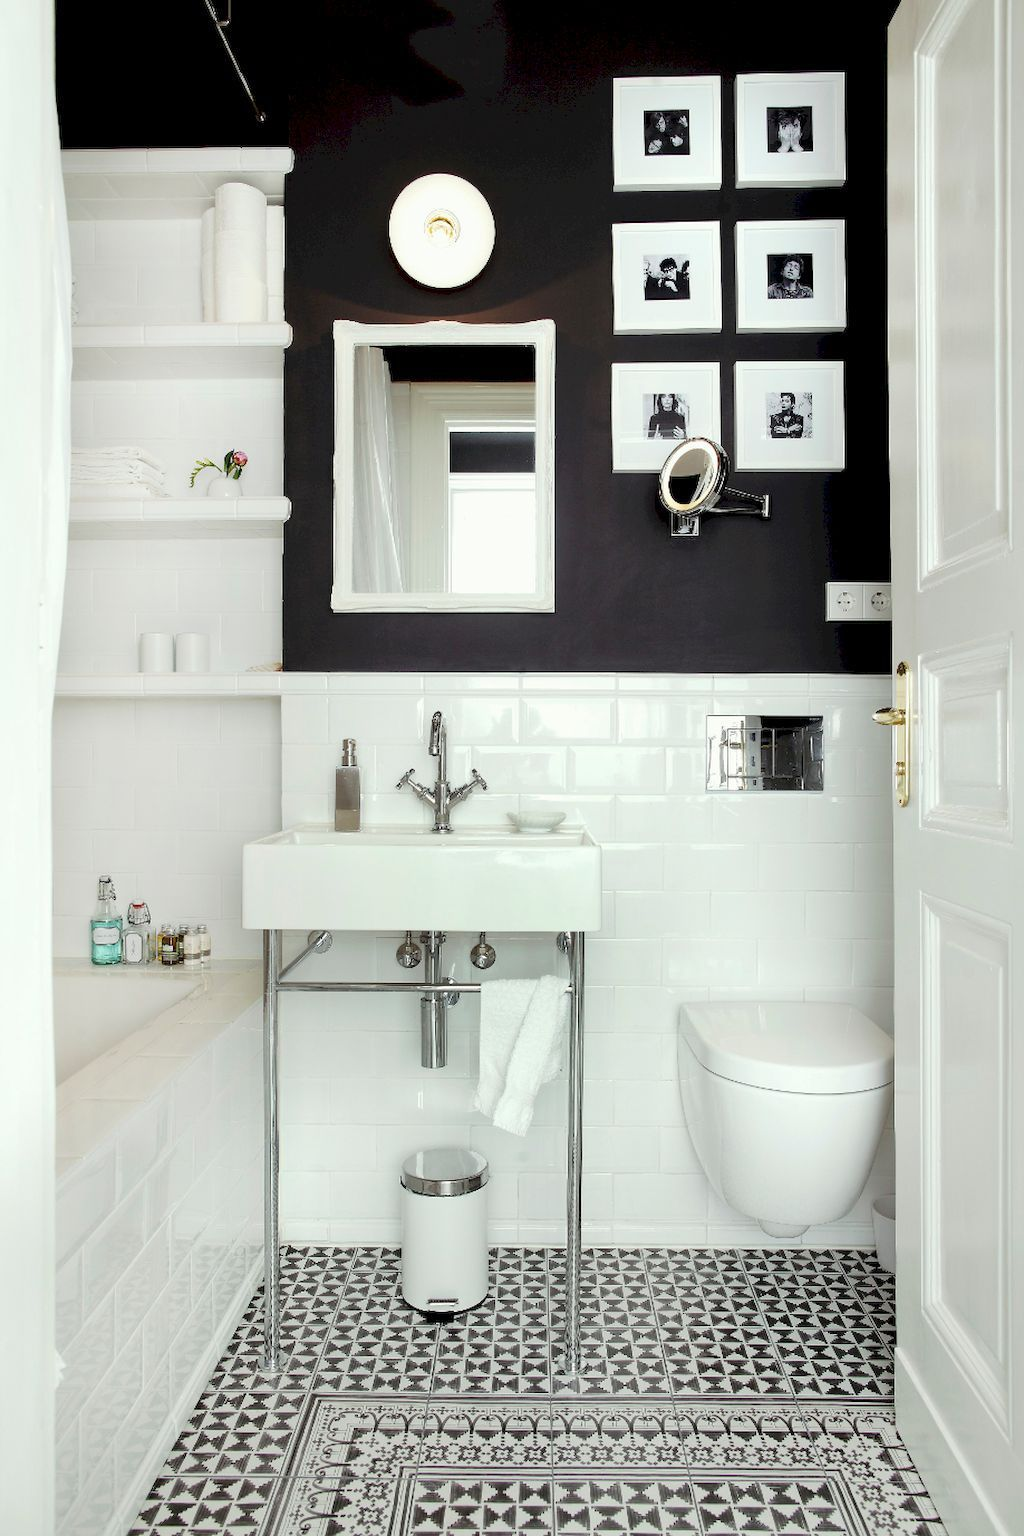 cool small bathroom remodel ideas 37 bathroom remodel on cool small bathroom design ideas id=81705